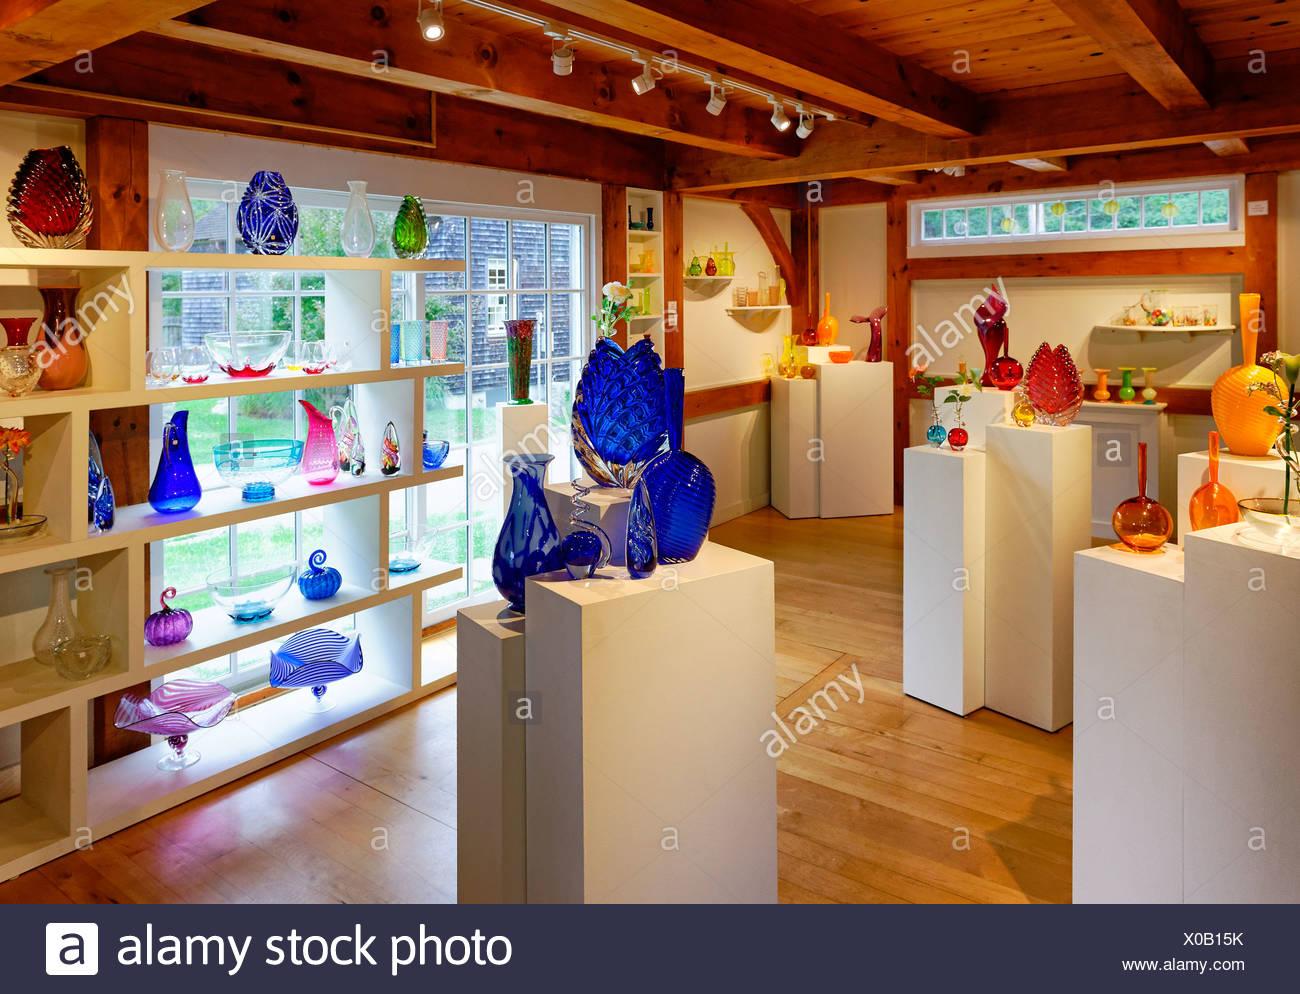 Showroom, Martha's Vineyard Glassworks, West Tisbury, Martha's Vineyard, Massachusetts, USA - Stock Image